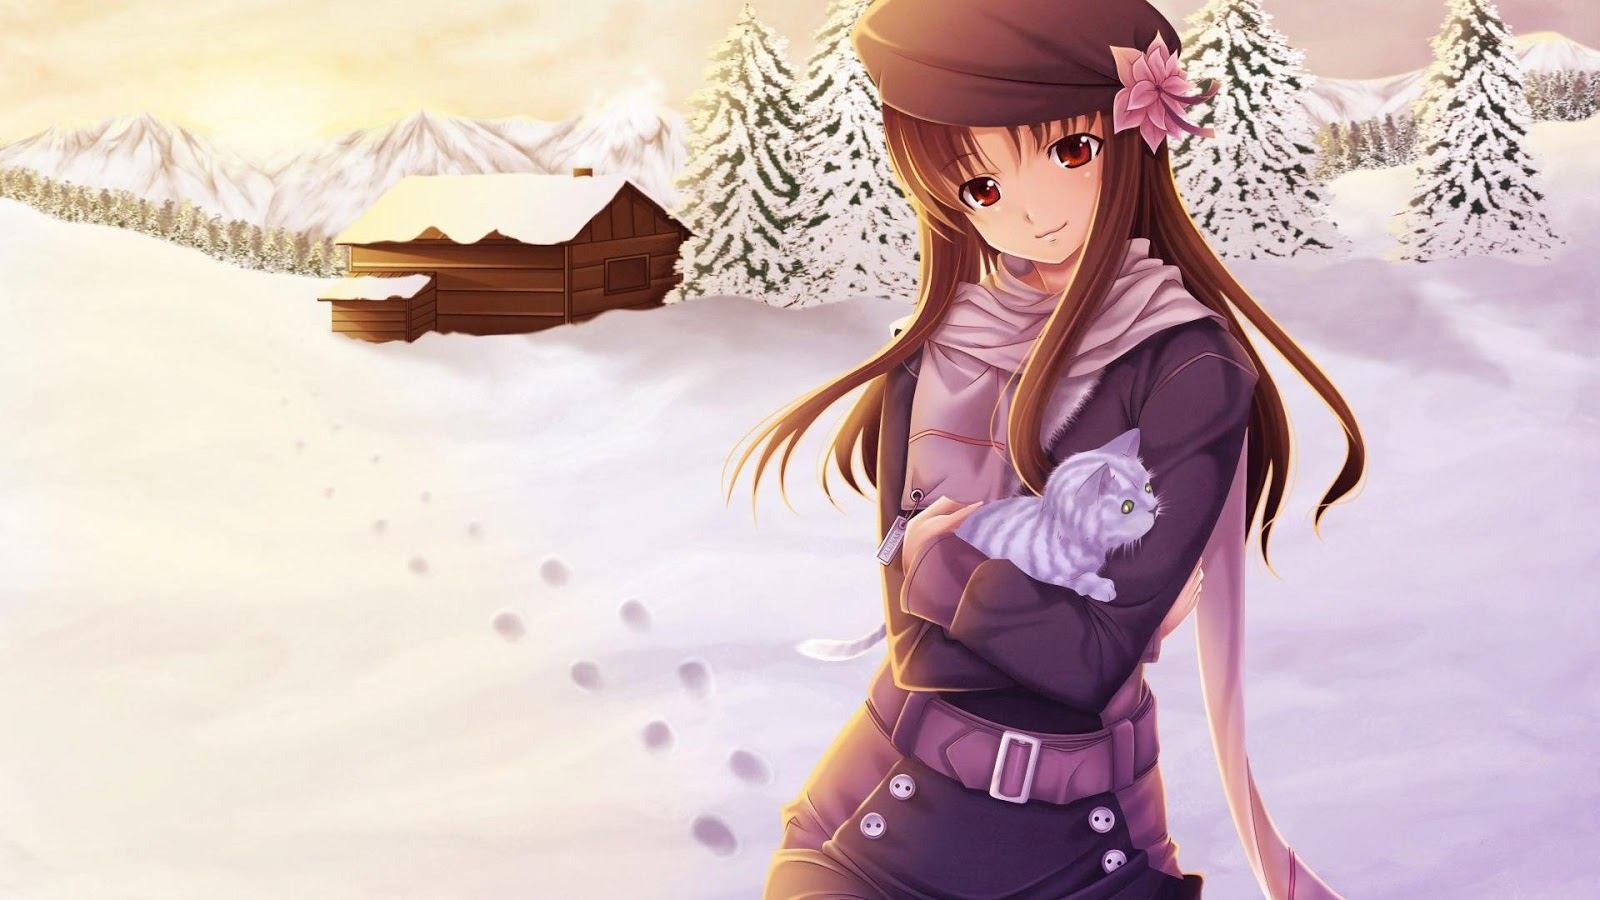 Update gambar wallpaper anime hd keren terbaru - Foto anime keren hd ...